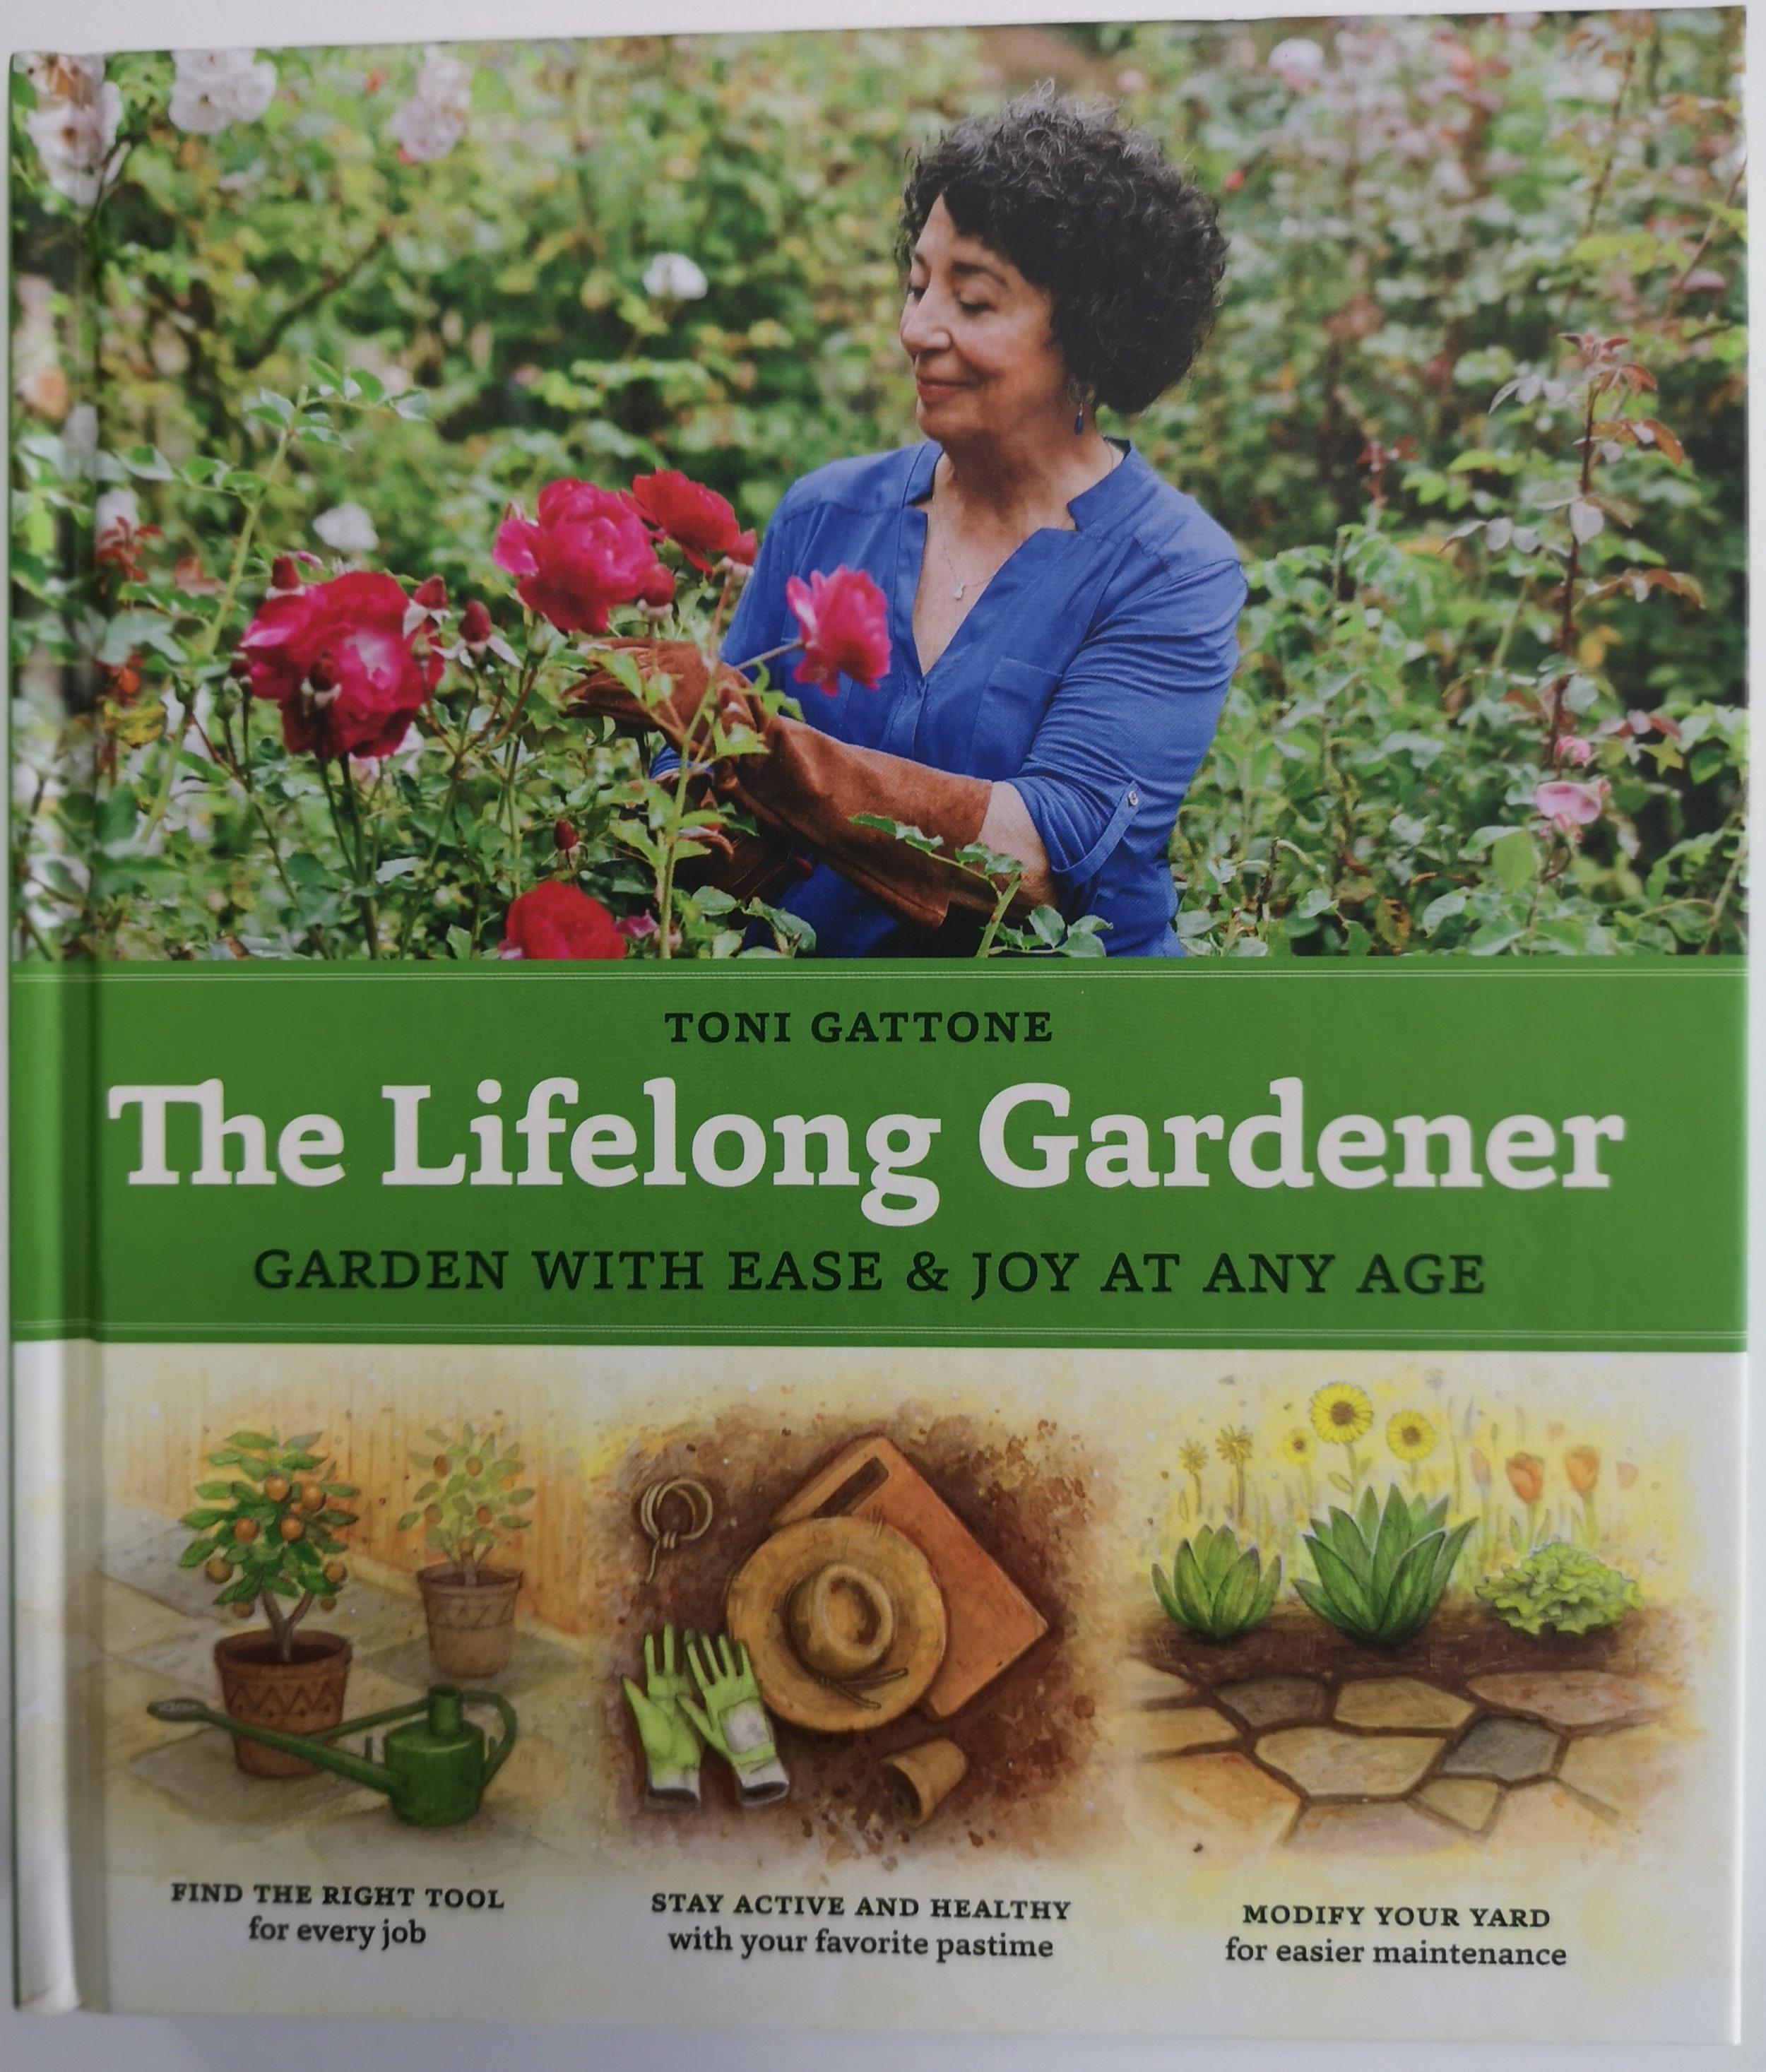 Toni Gattone: The Lifelong Gardener